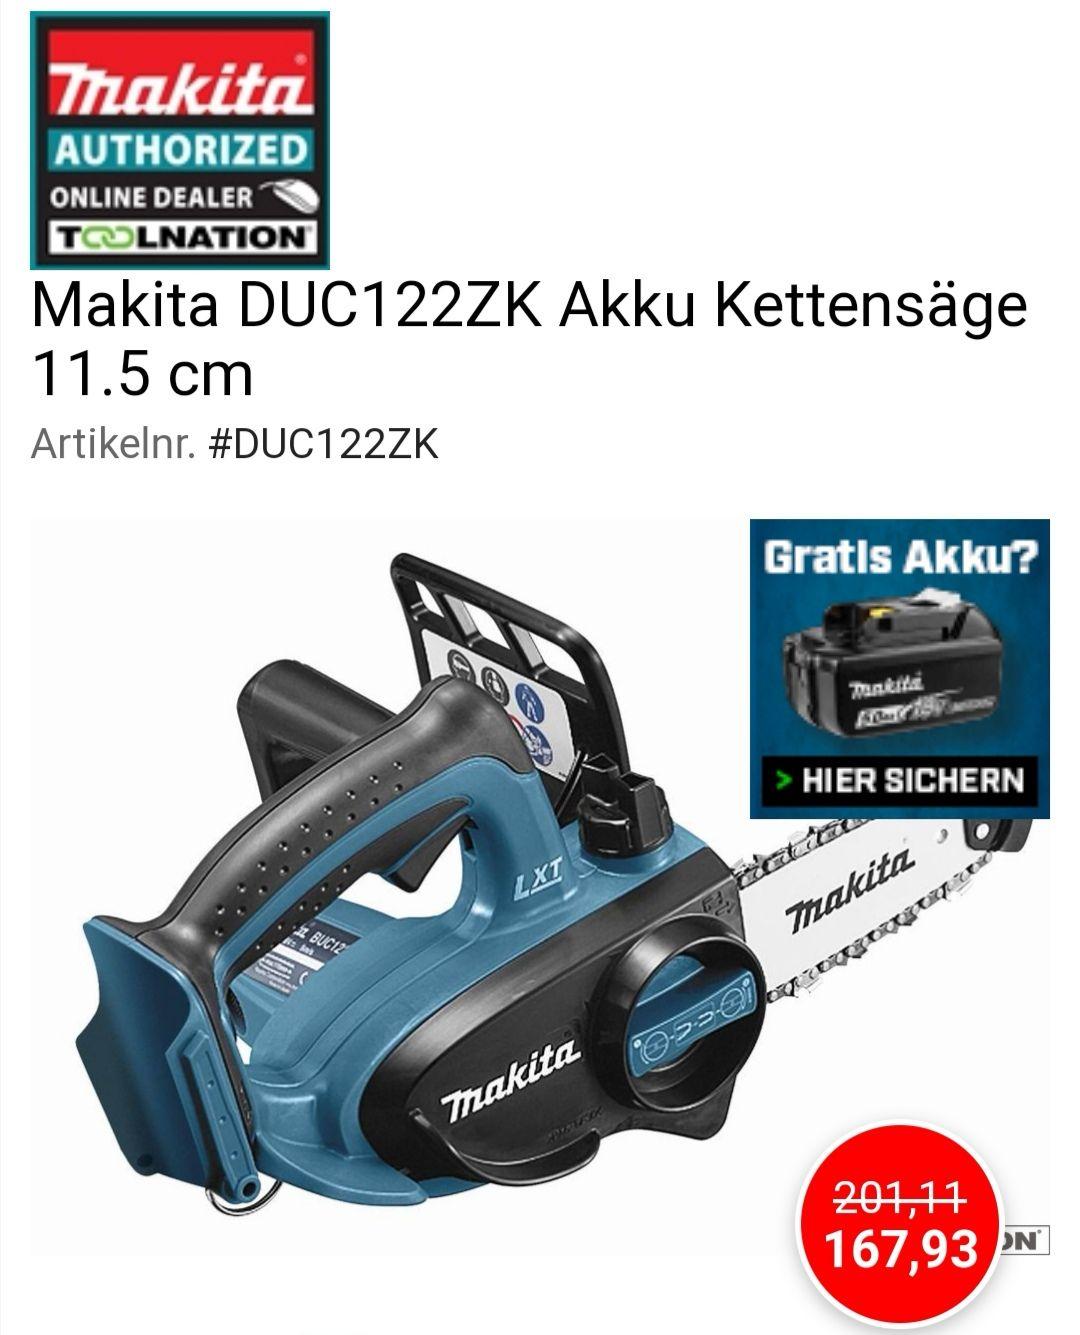 Makita DUC122ZK Akku Kettensäge 11.5 cm bei Toolnation